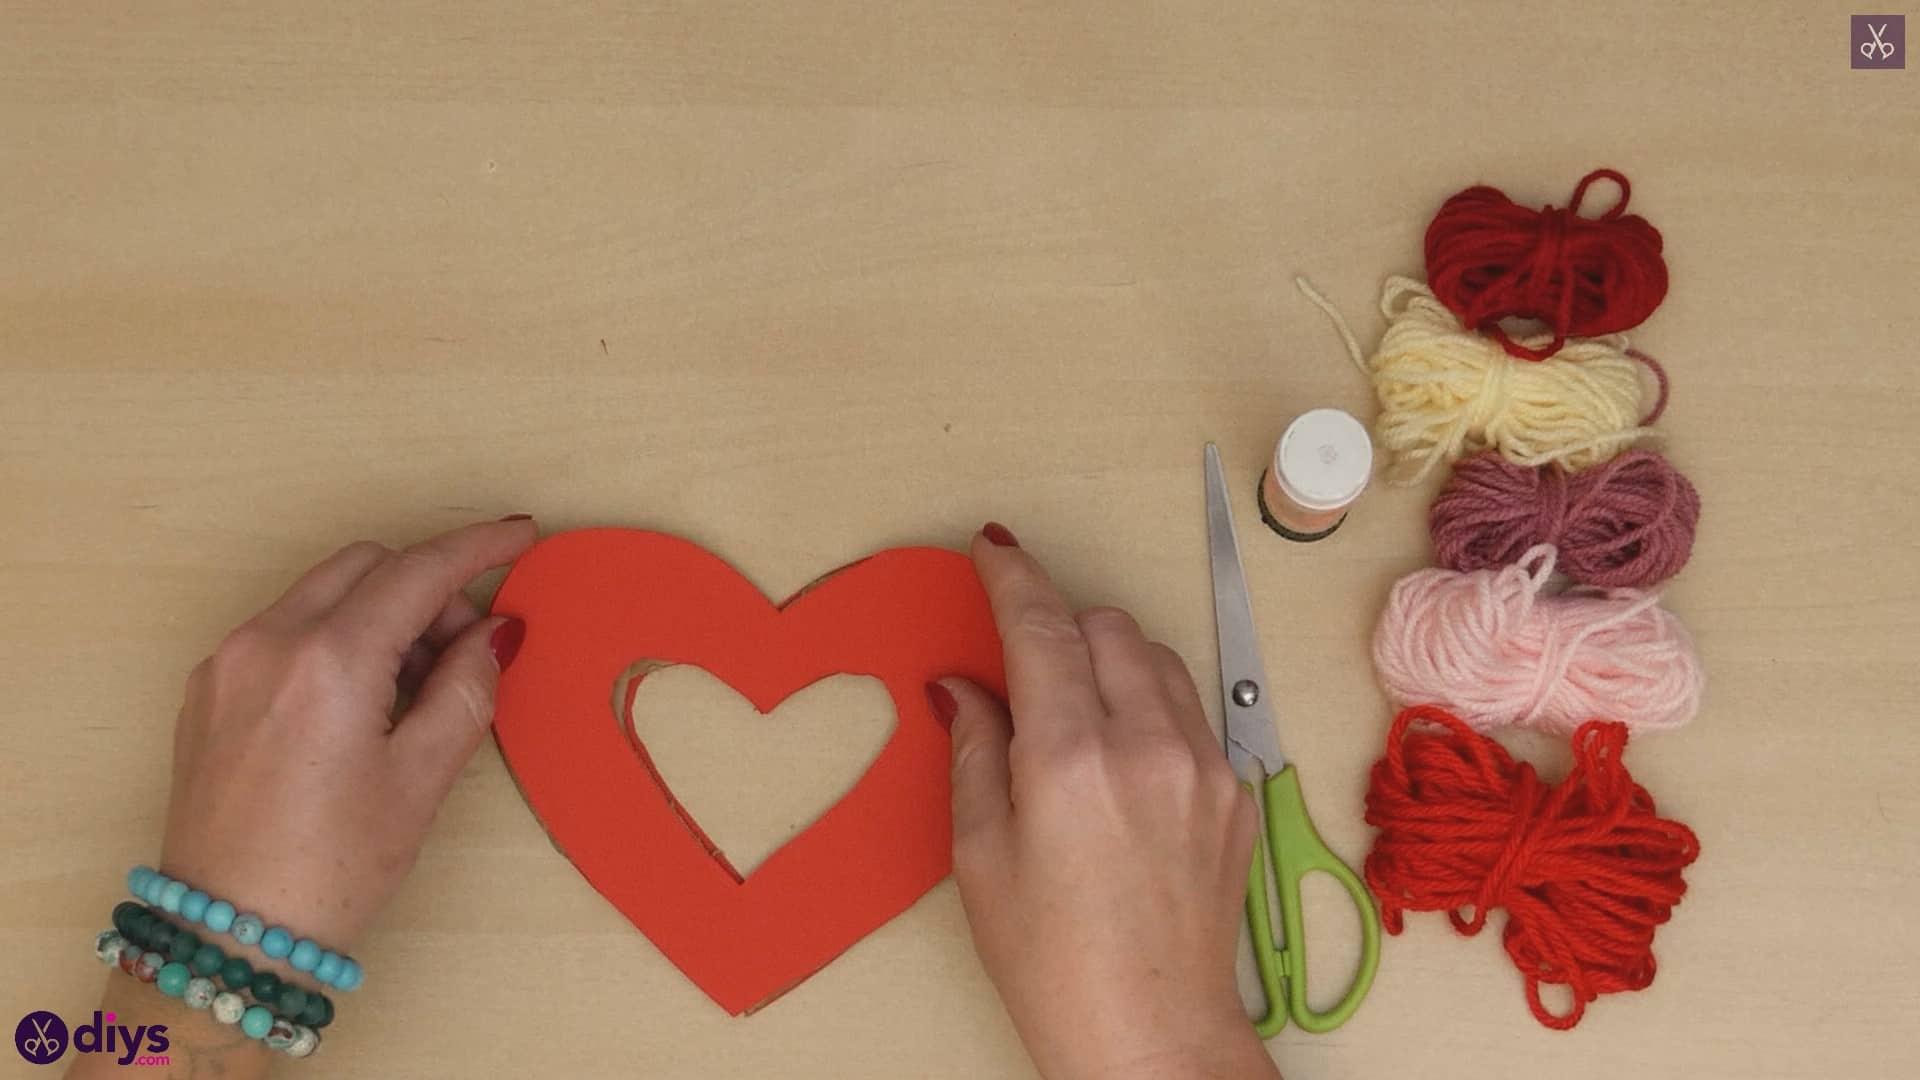 Diy yarn wrapped paper heart step 4b